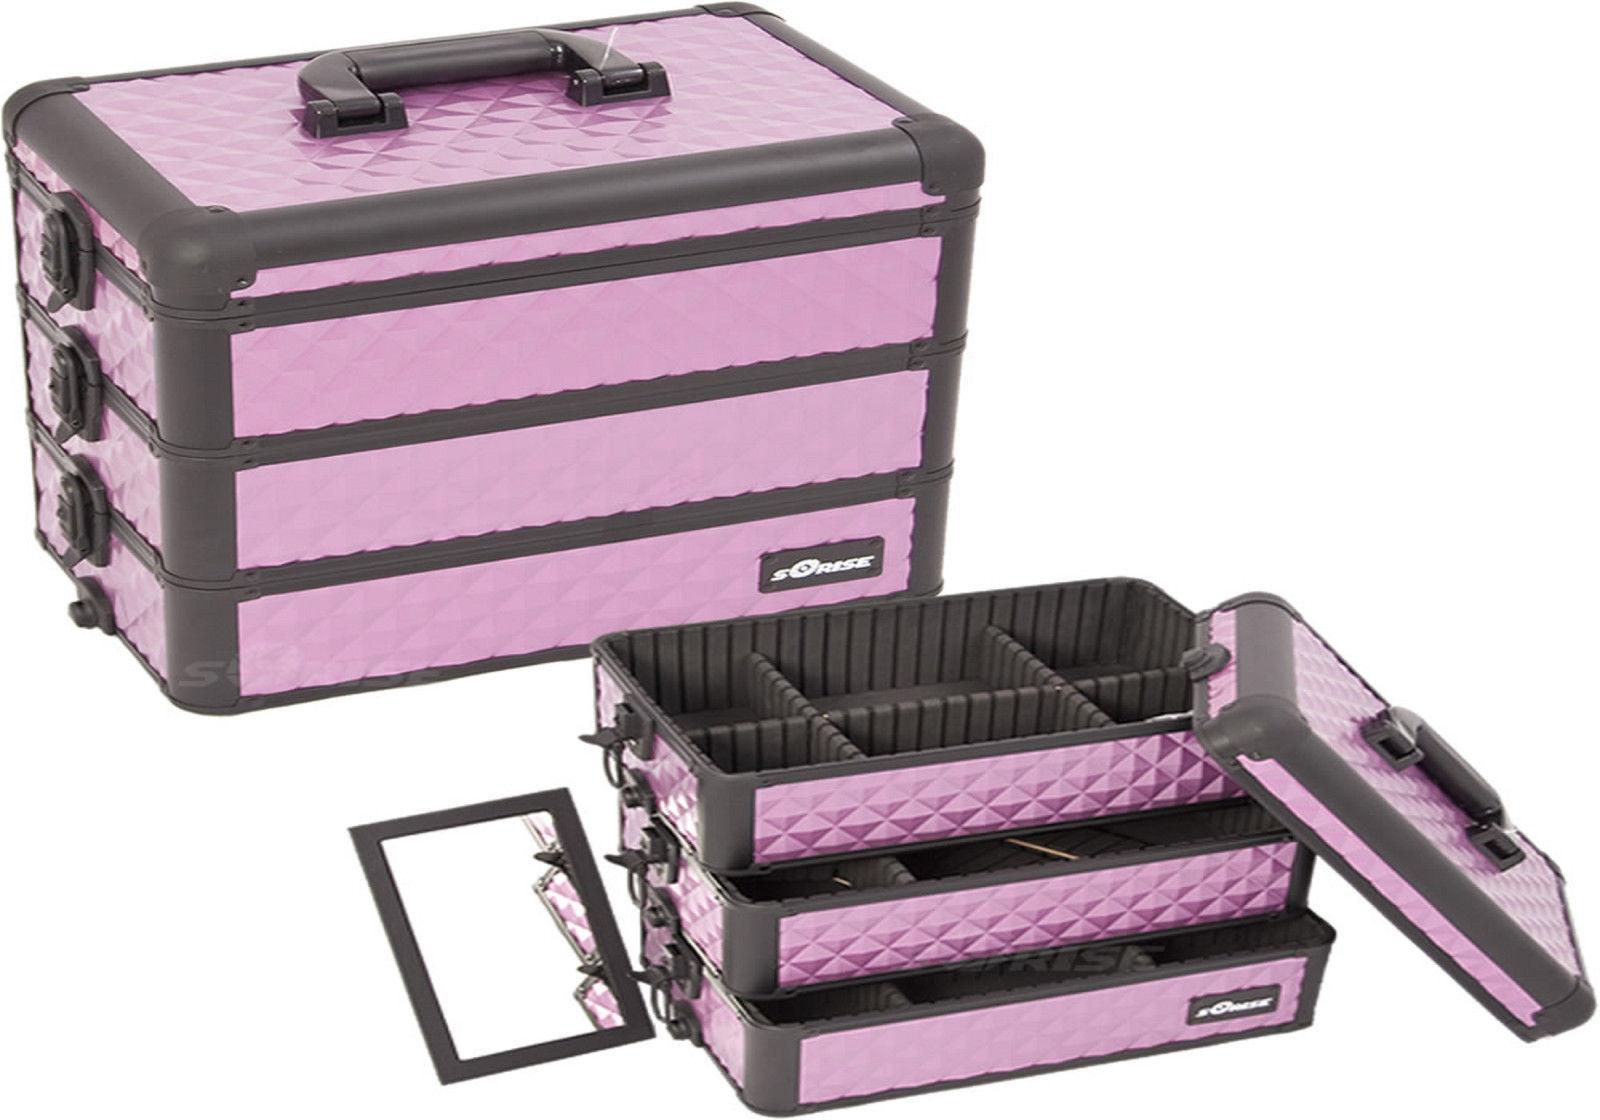 OPI Nail Polish Manicure Cosmetics Makeup Organizers Storage Beauty Case Travel image 7